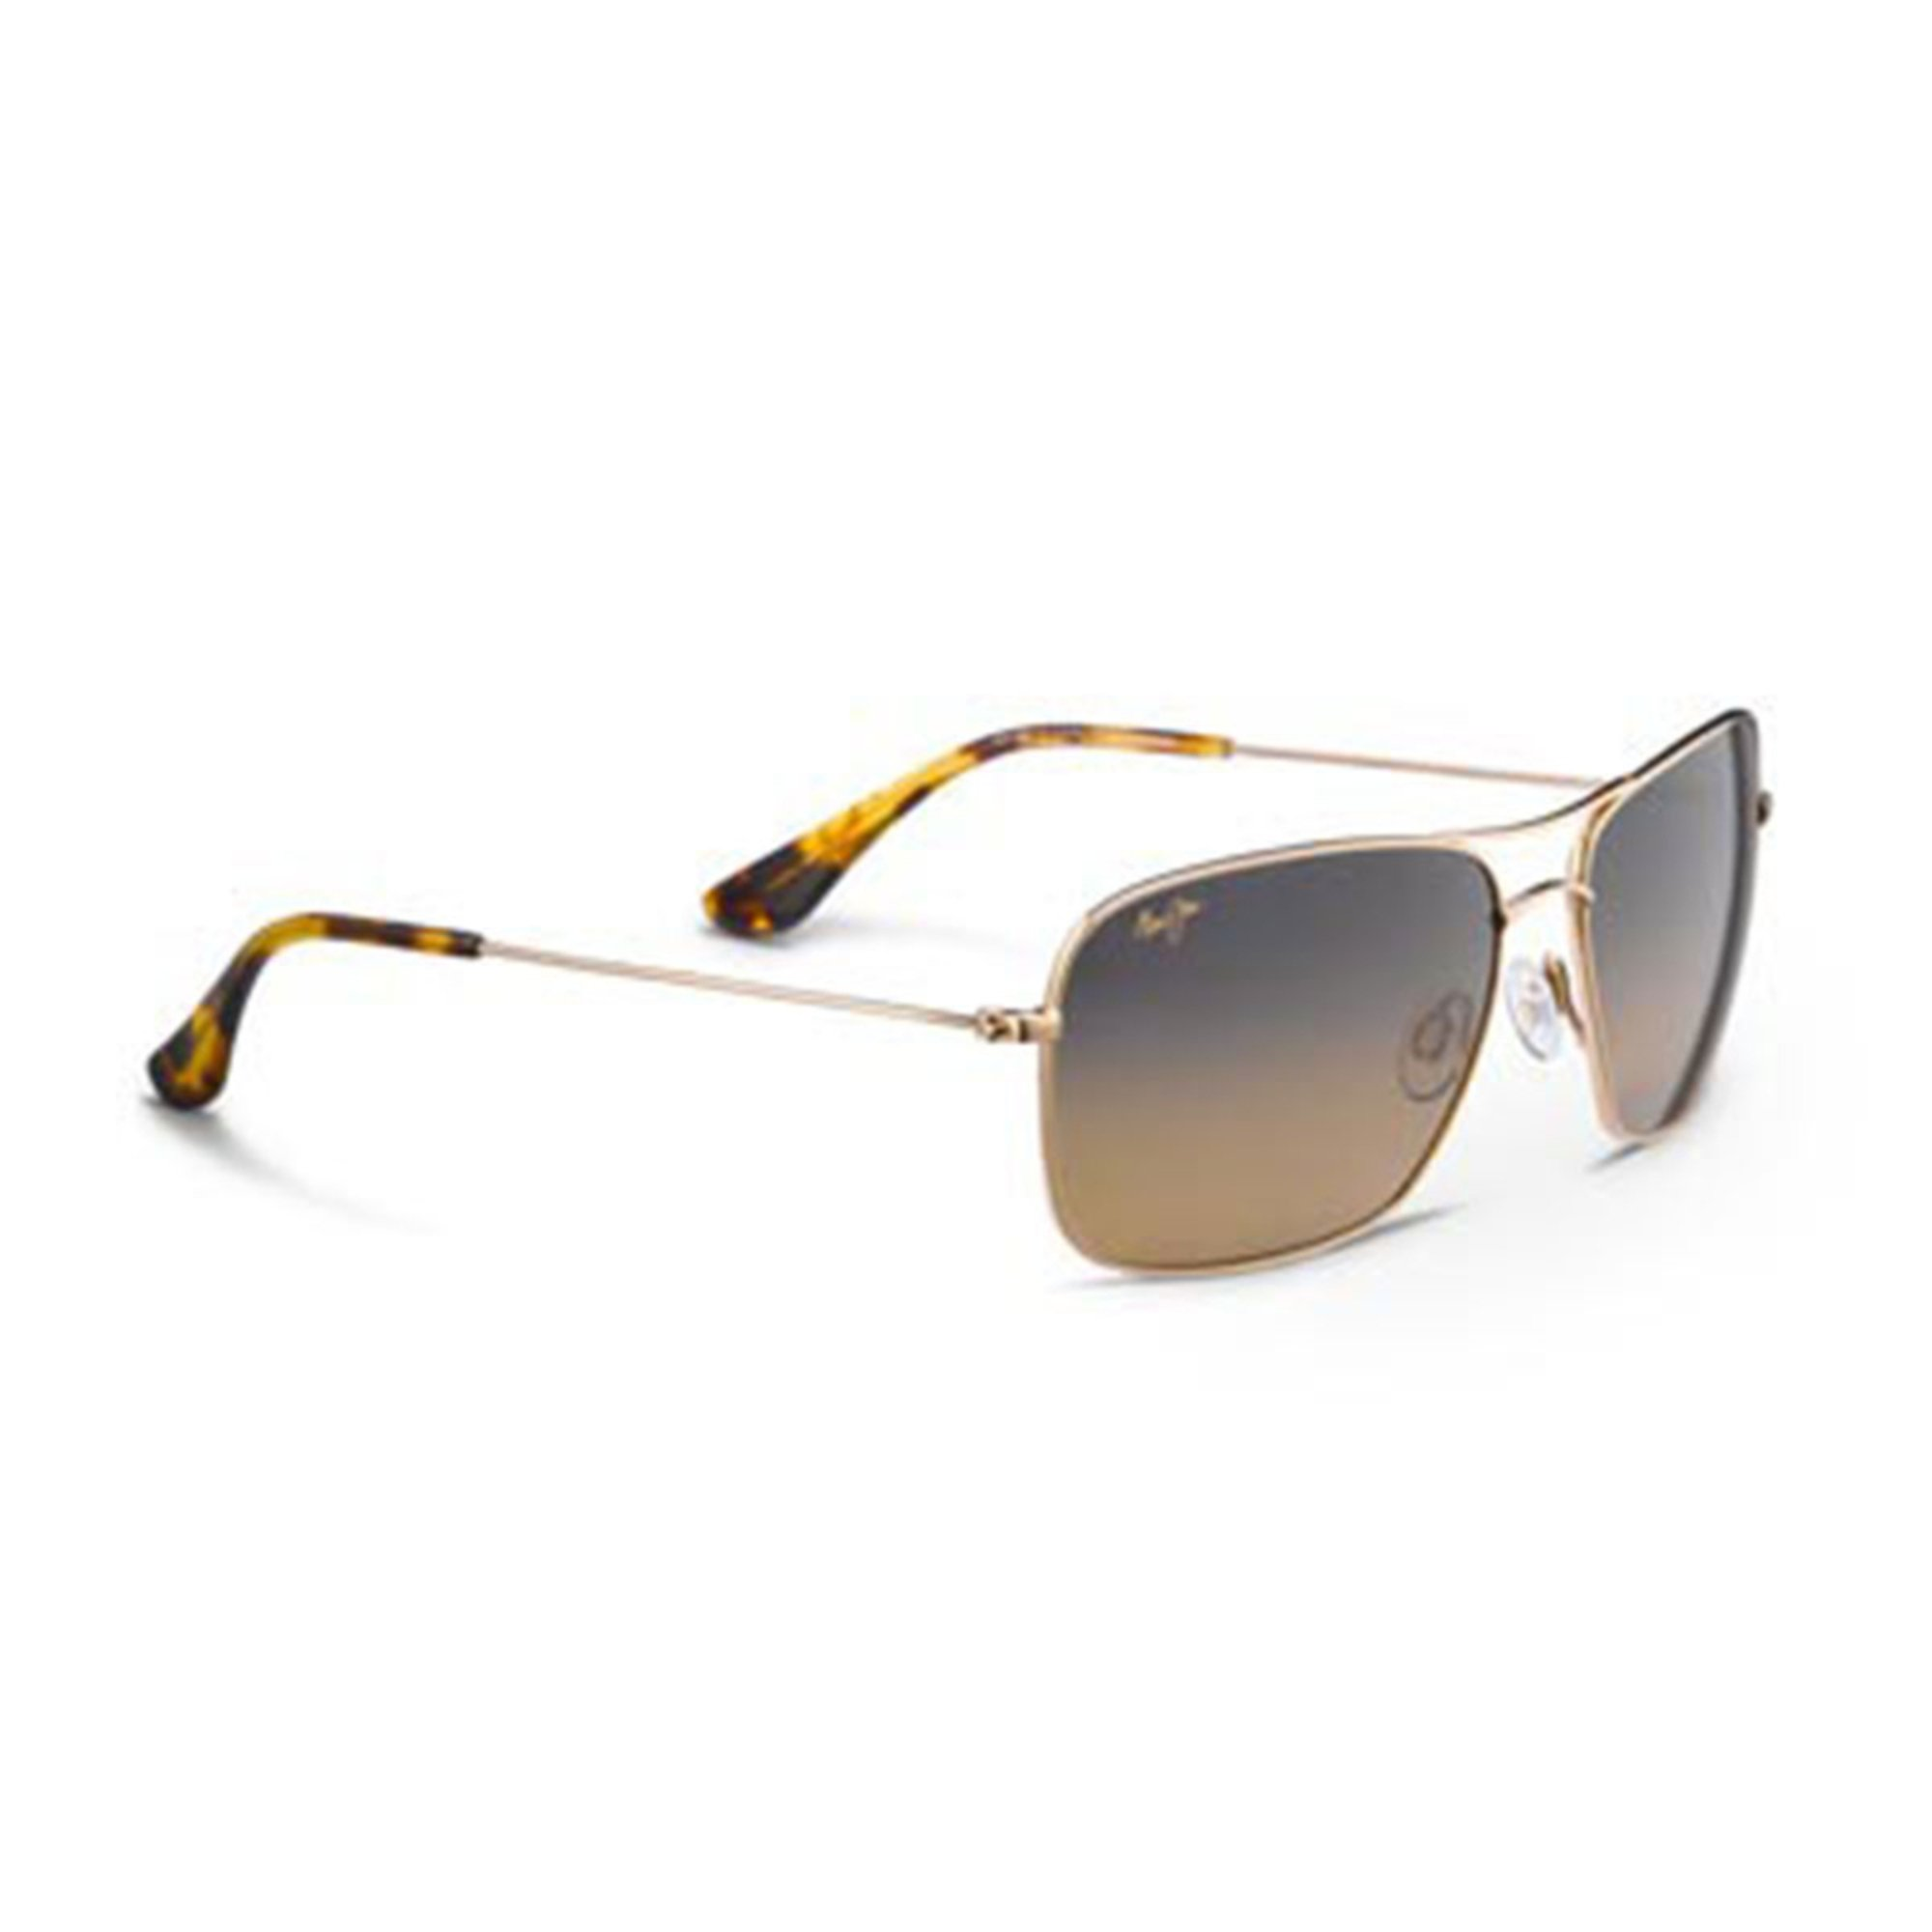 Jim Gold Polarized Unisex Wiki Maui Sunglasses Aviator WD2E9IH